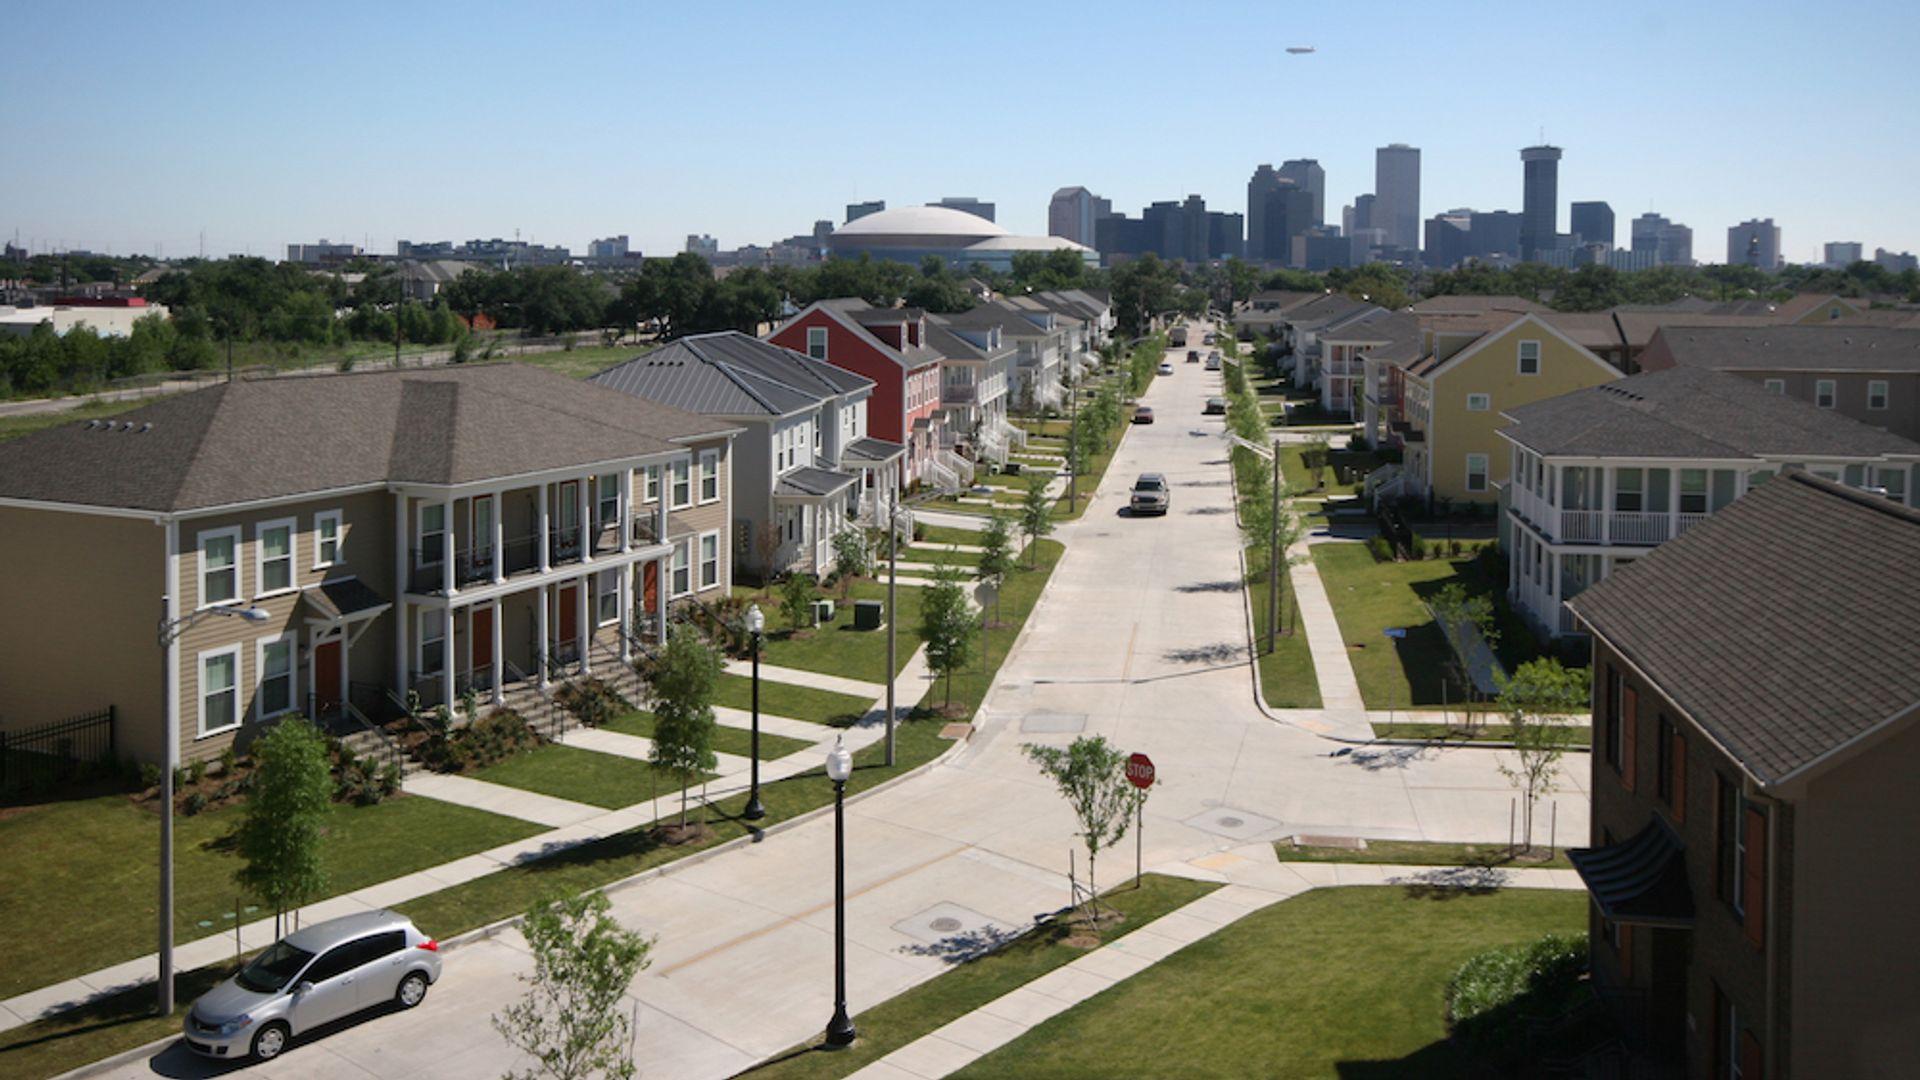 3-bed apartment at 3300 Clara Street, New Orleans, LA ...